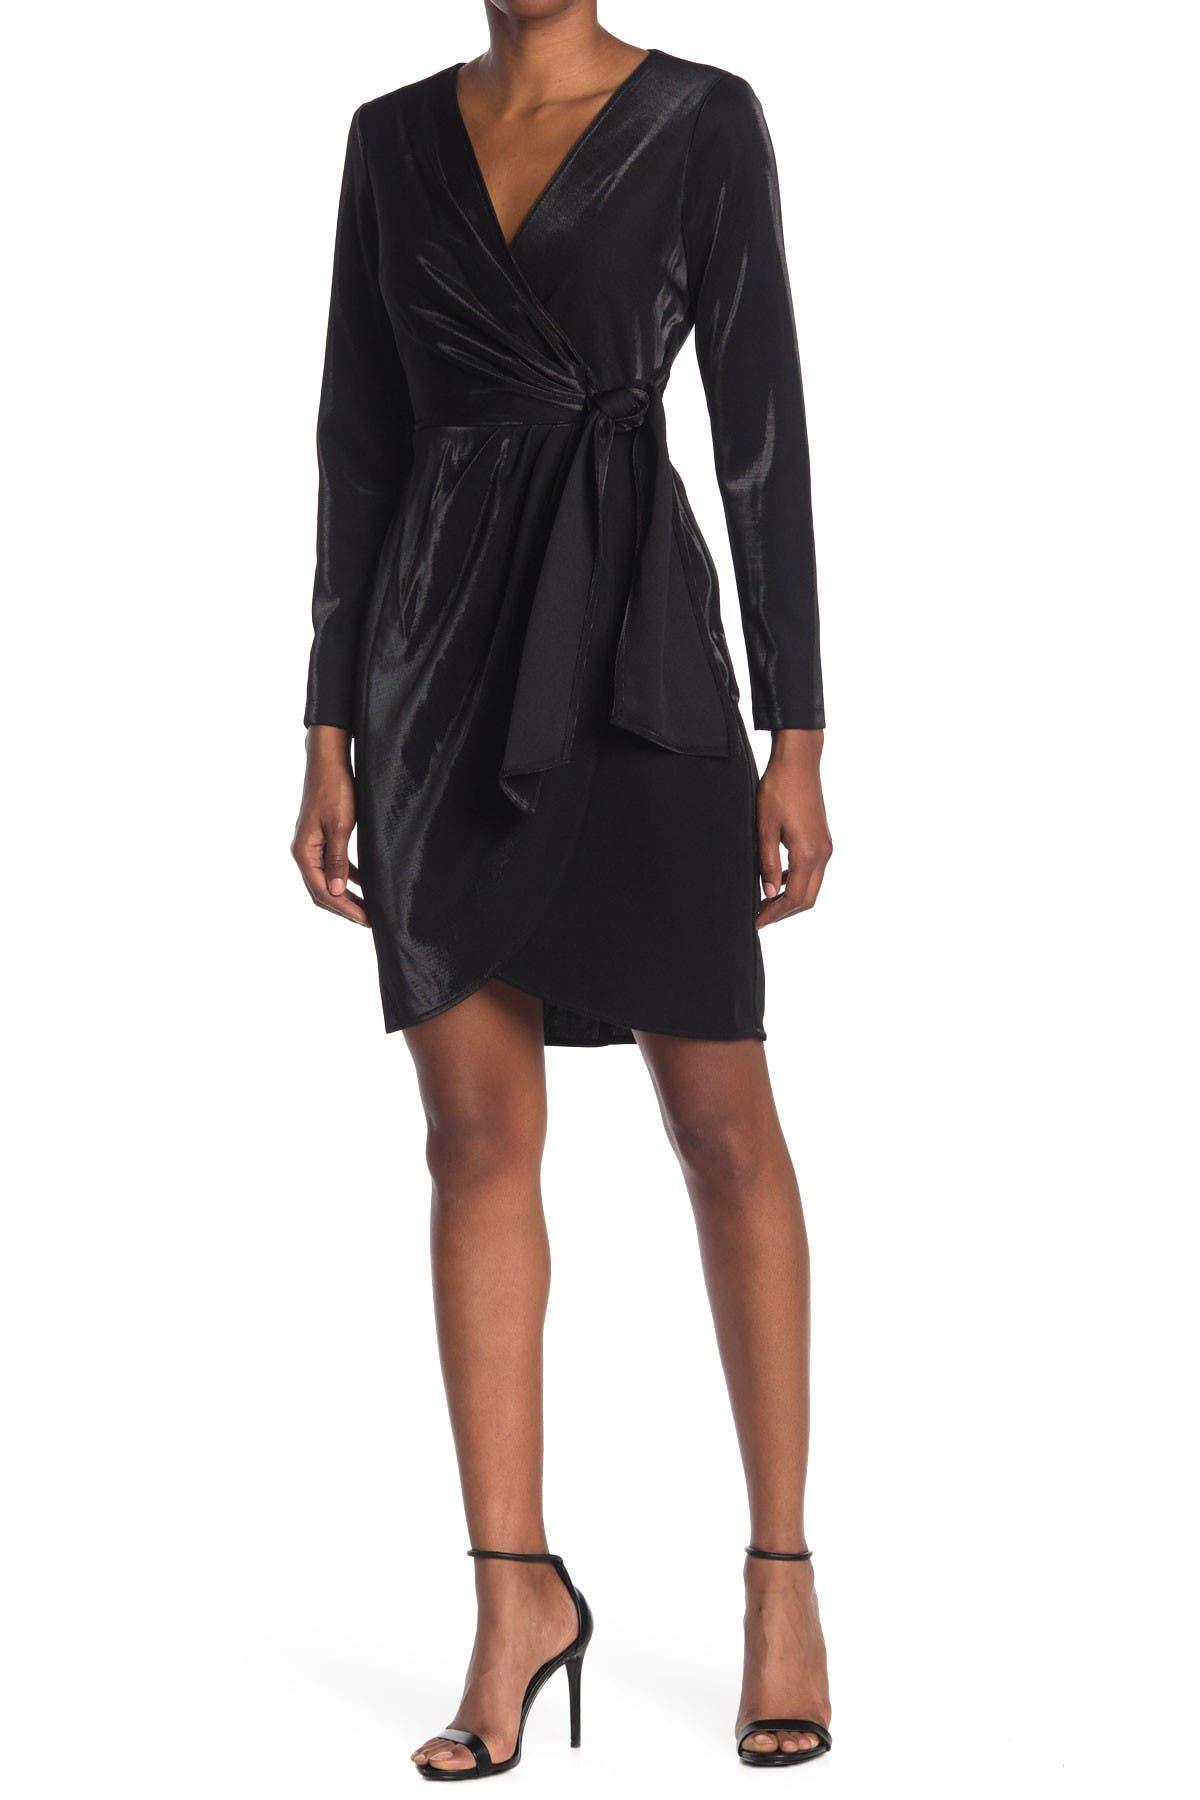 Image of Julia Jordan Liquid Jersey Long Sleeve Faux Wrap Dress